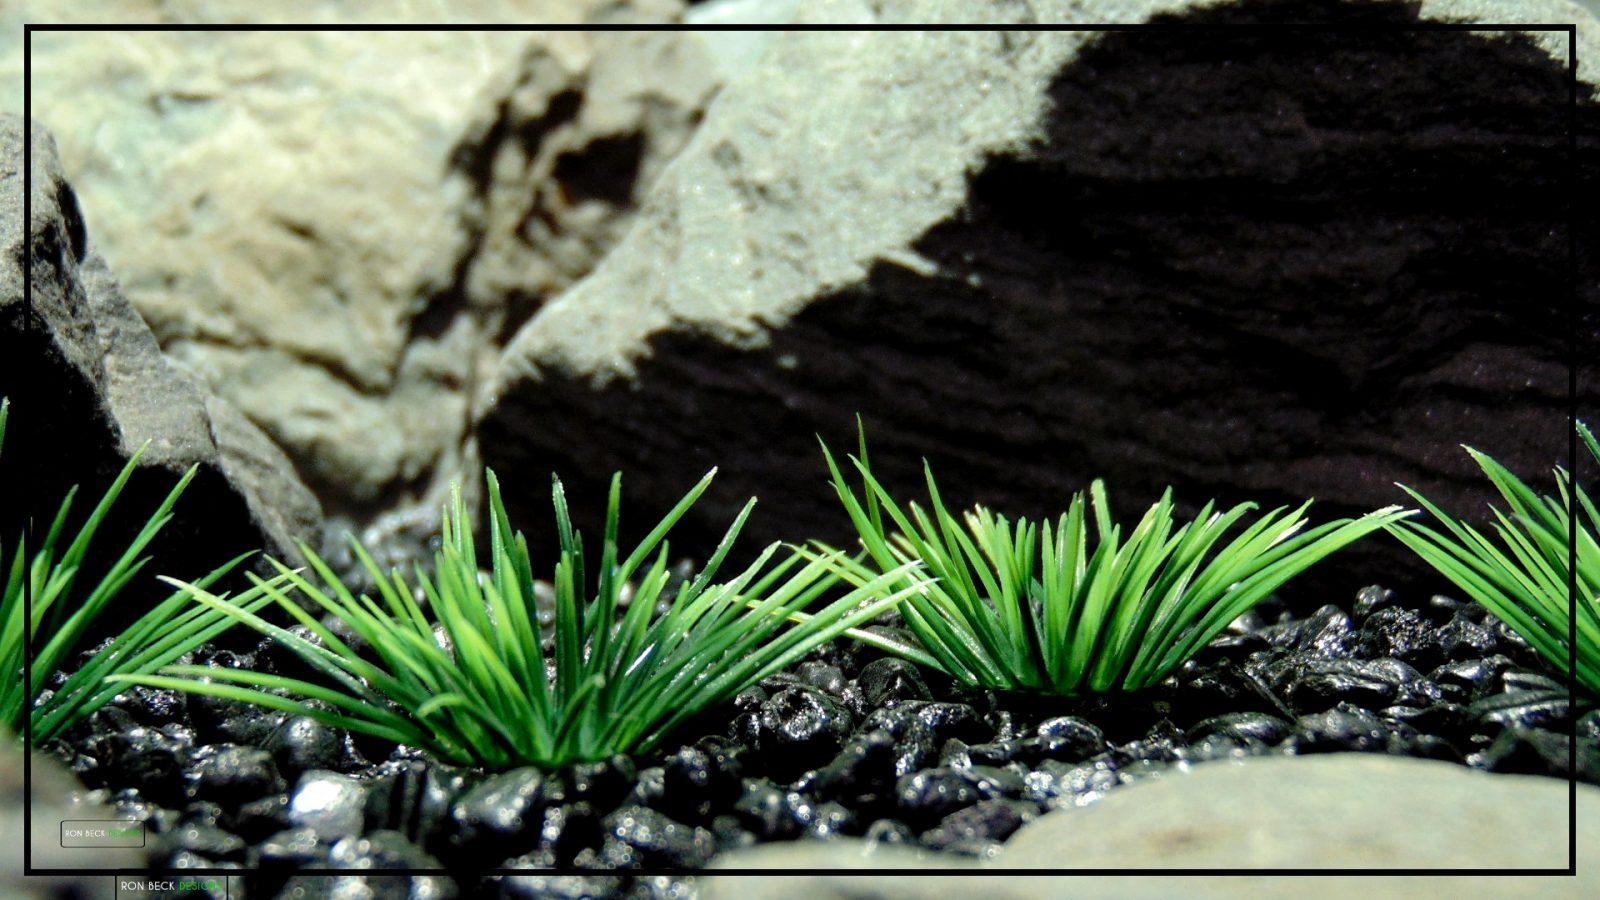 Artificial Urchin Grass Plot - Artificial Aquarium Plants - parp412 2